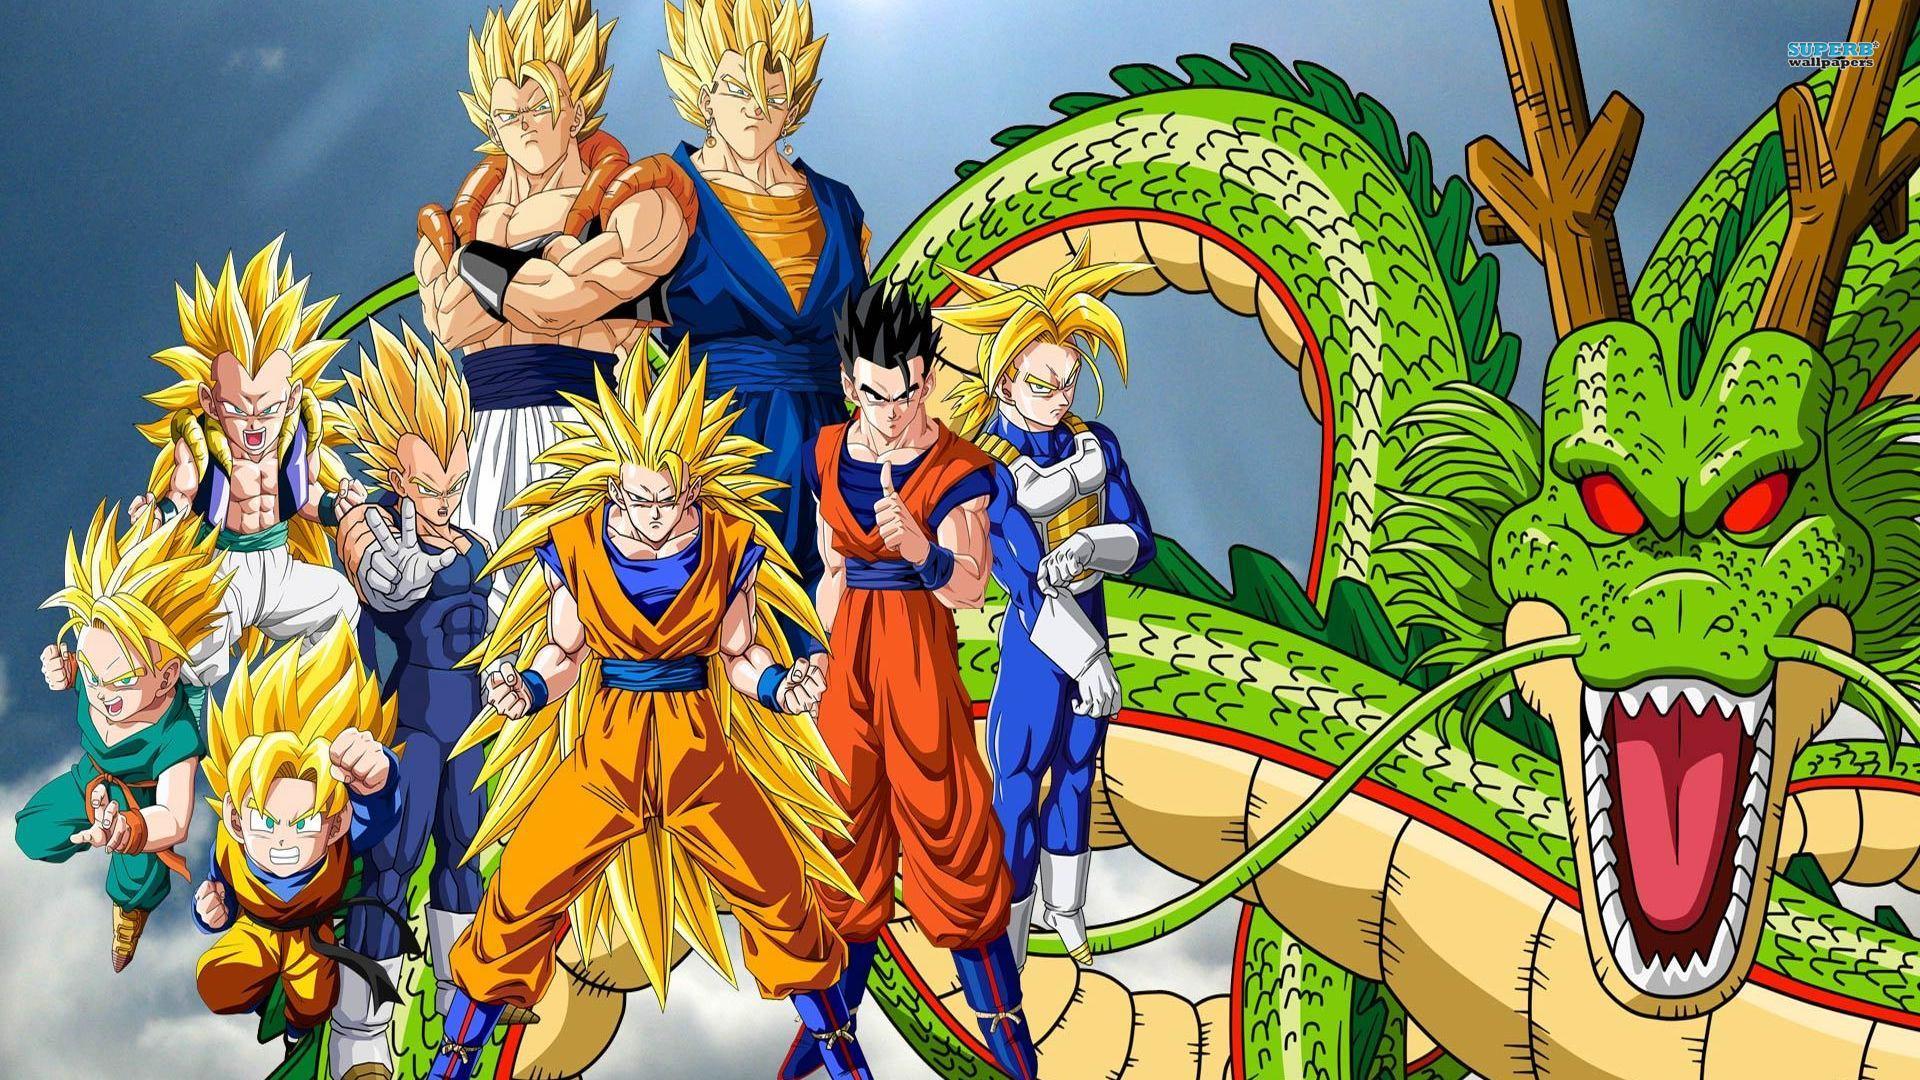 Wallpaper Dragon Ball Z Hd Gratuit A Telecharger Sur Ngn Mag